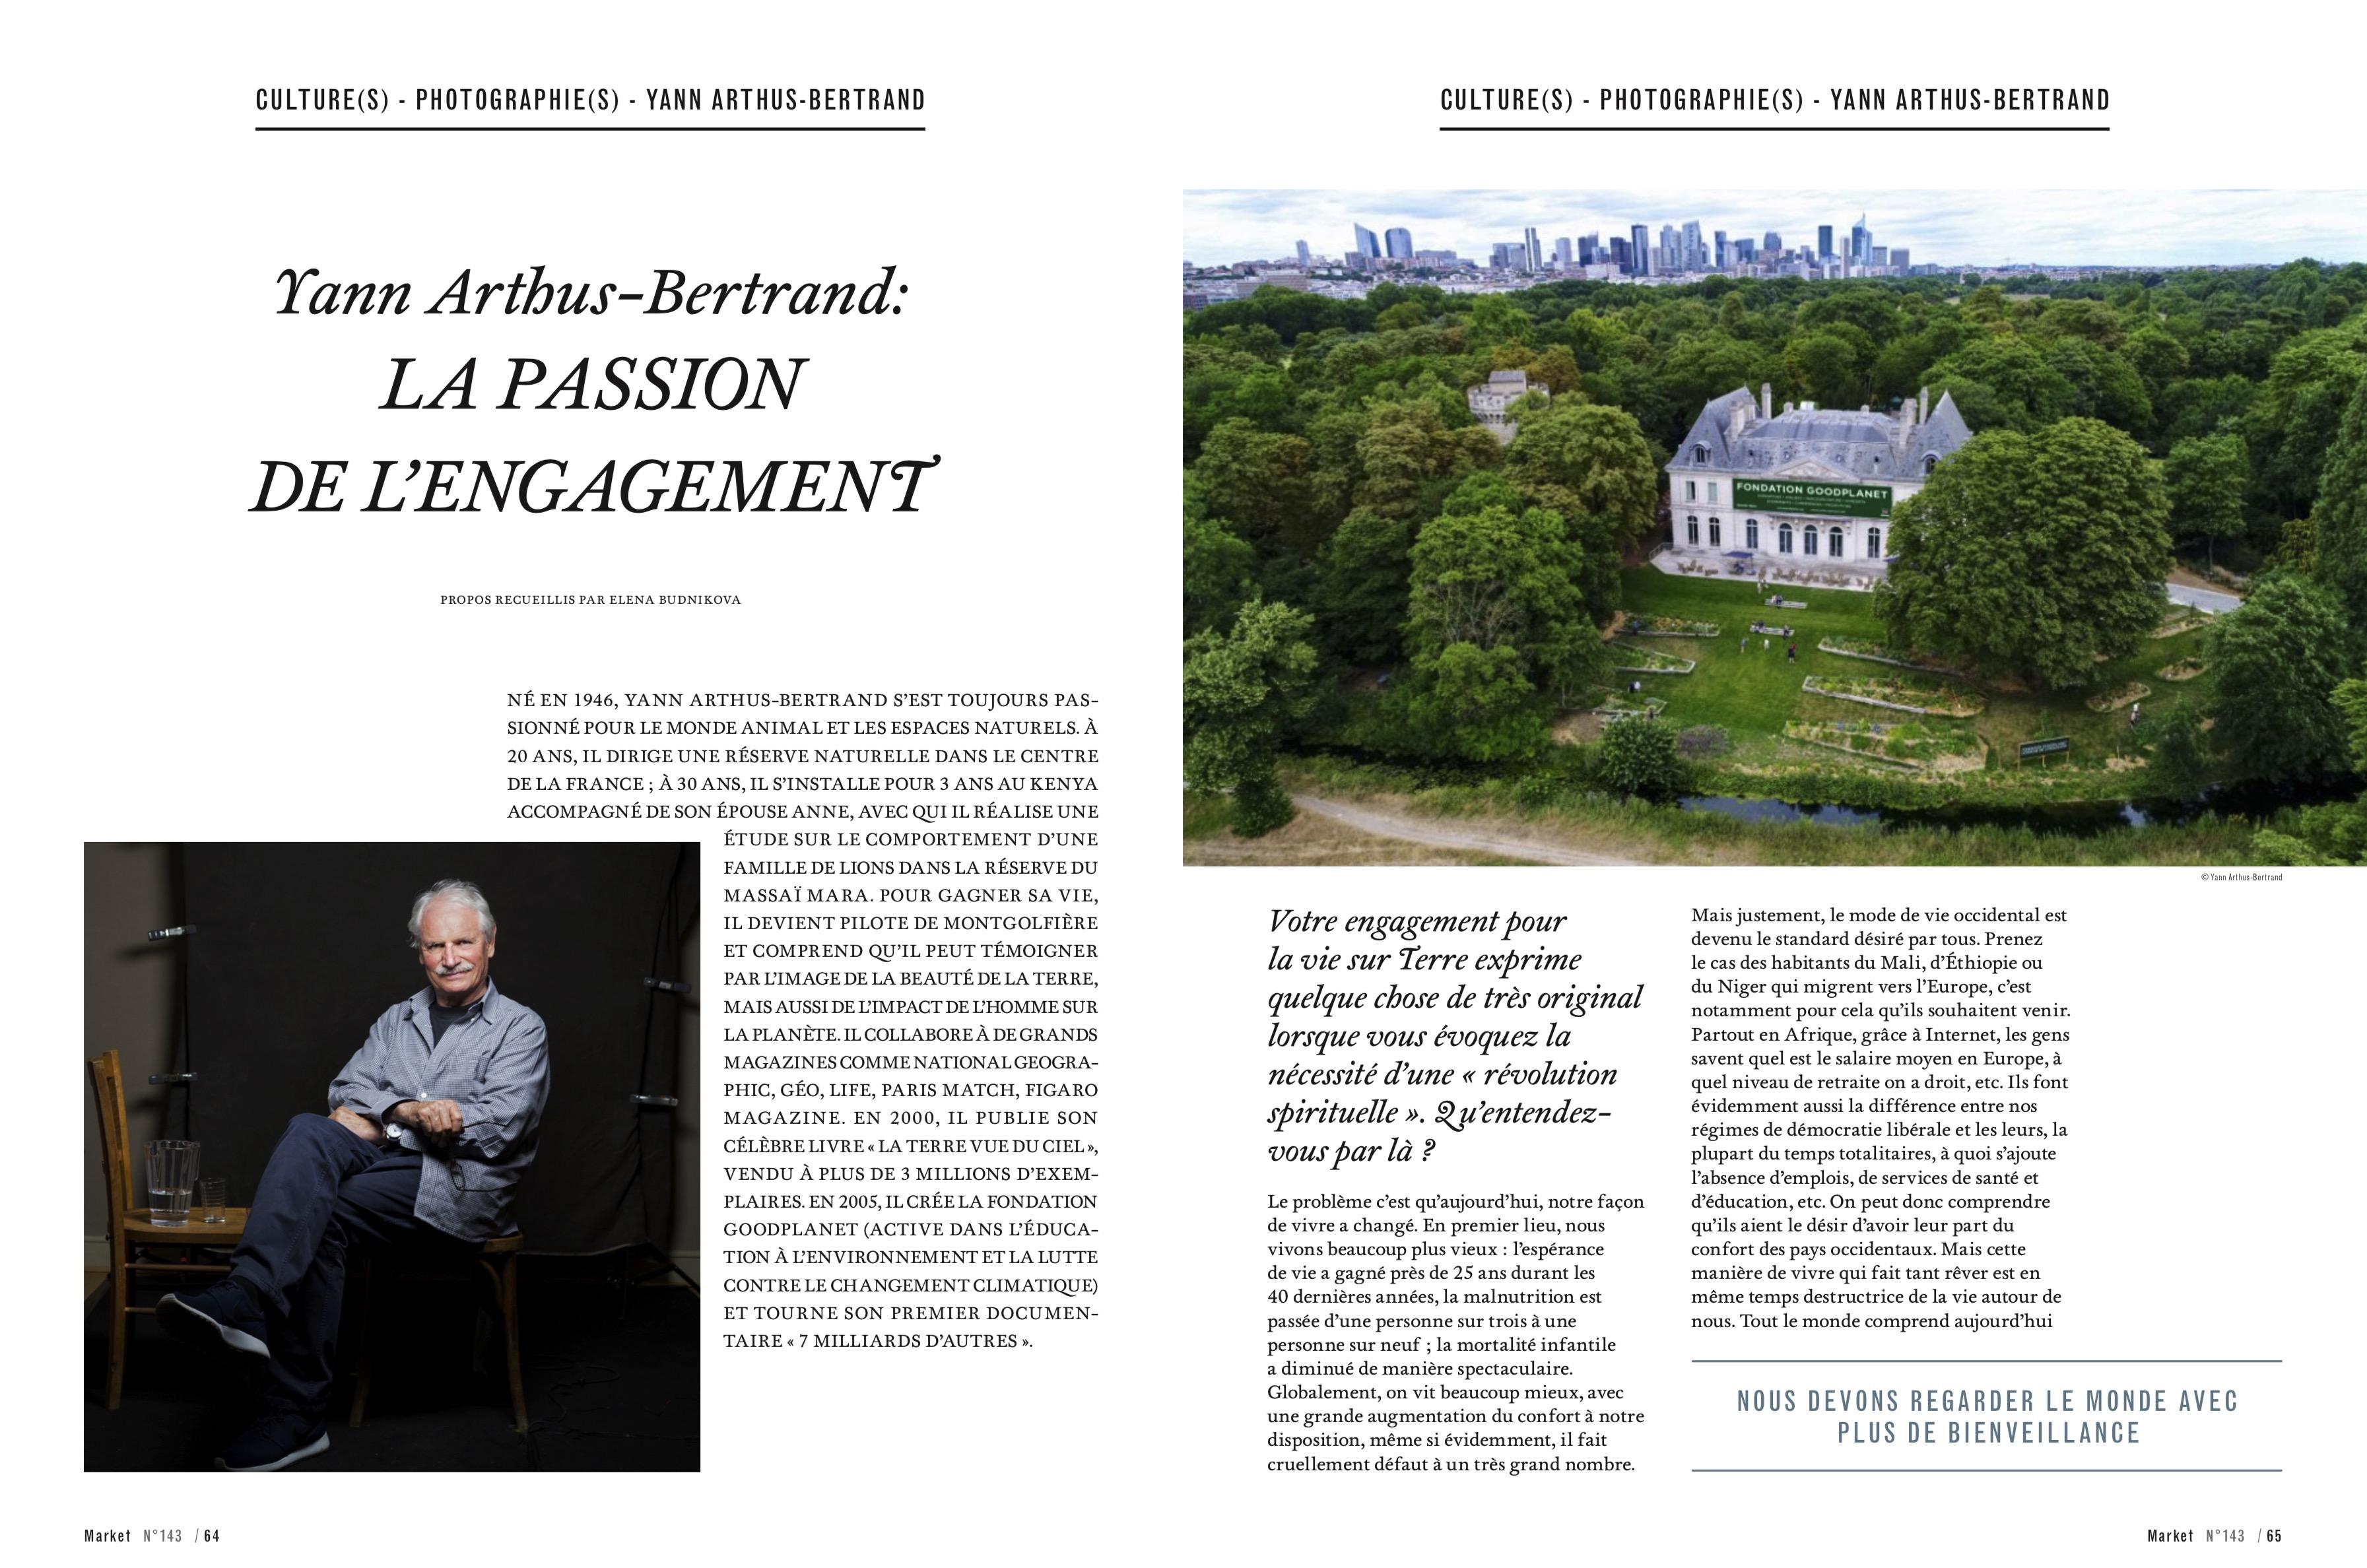 Magazine Market № 143, Geneva. Interview and portrait of Yann Arthus-Bertrand